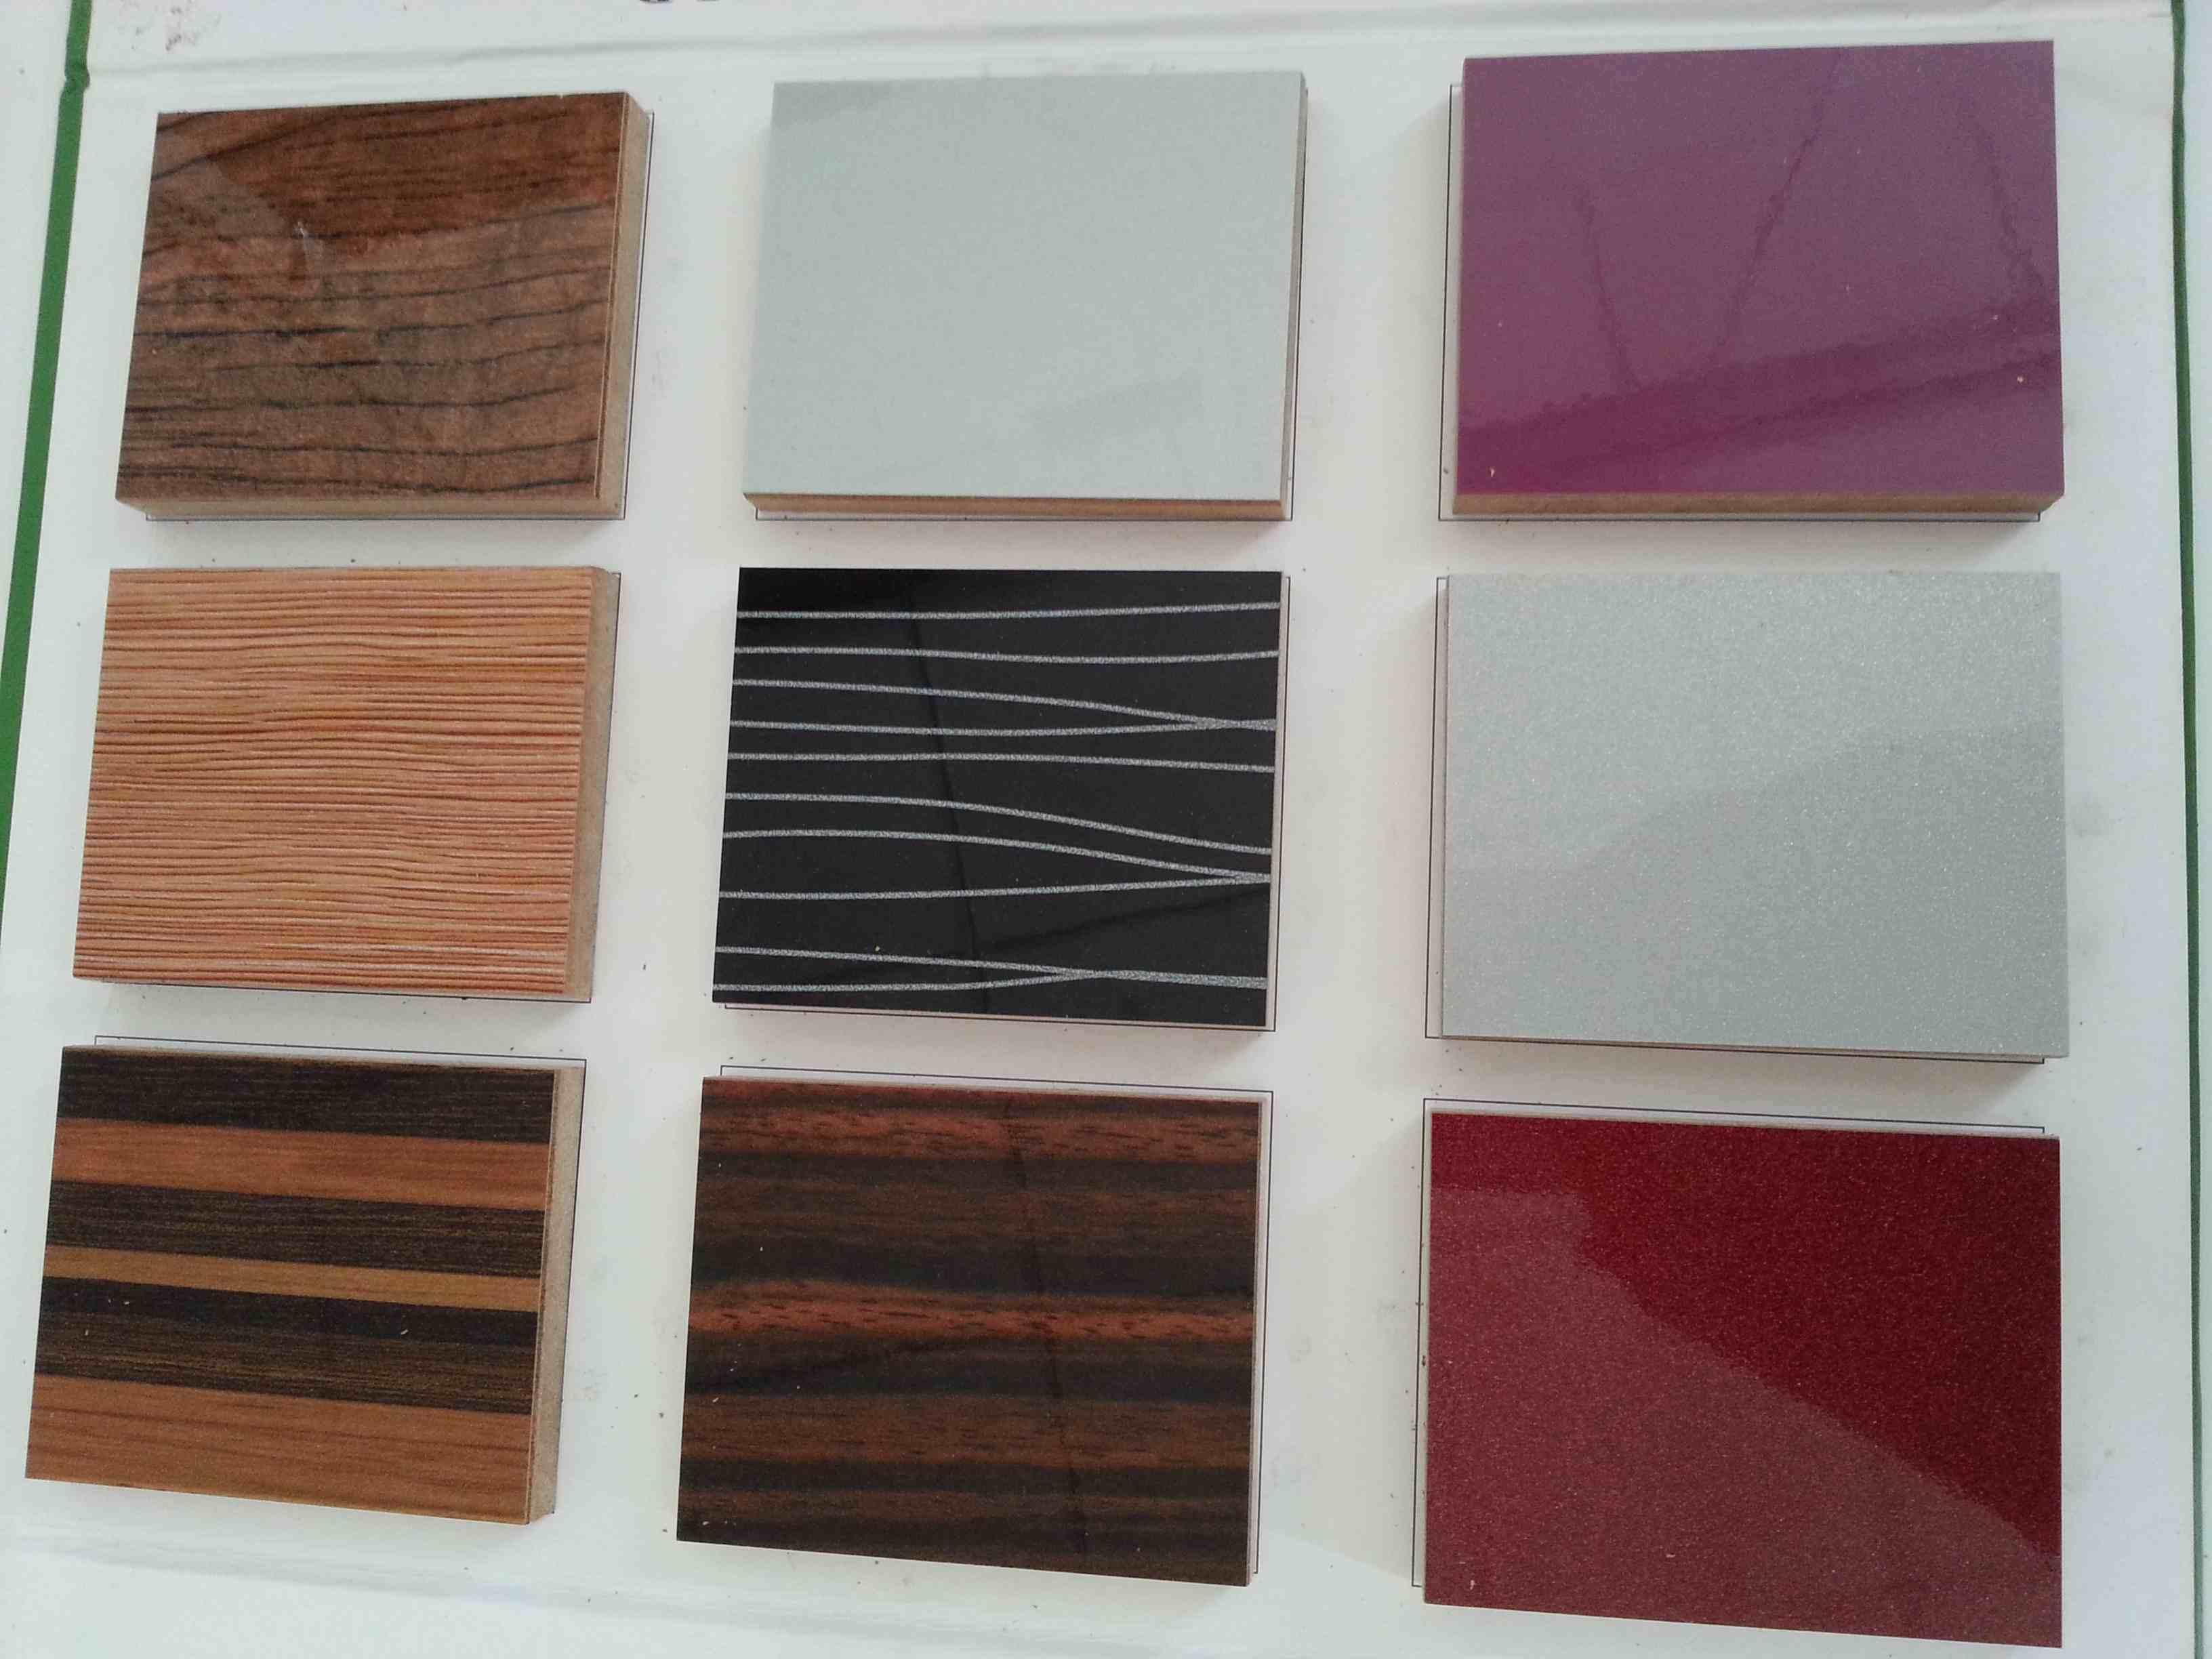 ... Mdf Kitchen Cabinets 100 Mdf For Kitchen Cabinets Spray Painting Mdf  Kitchen ...